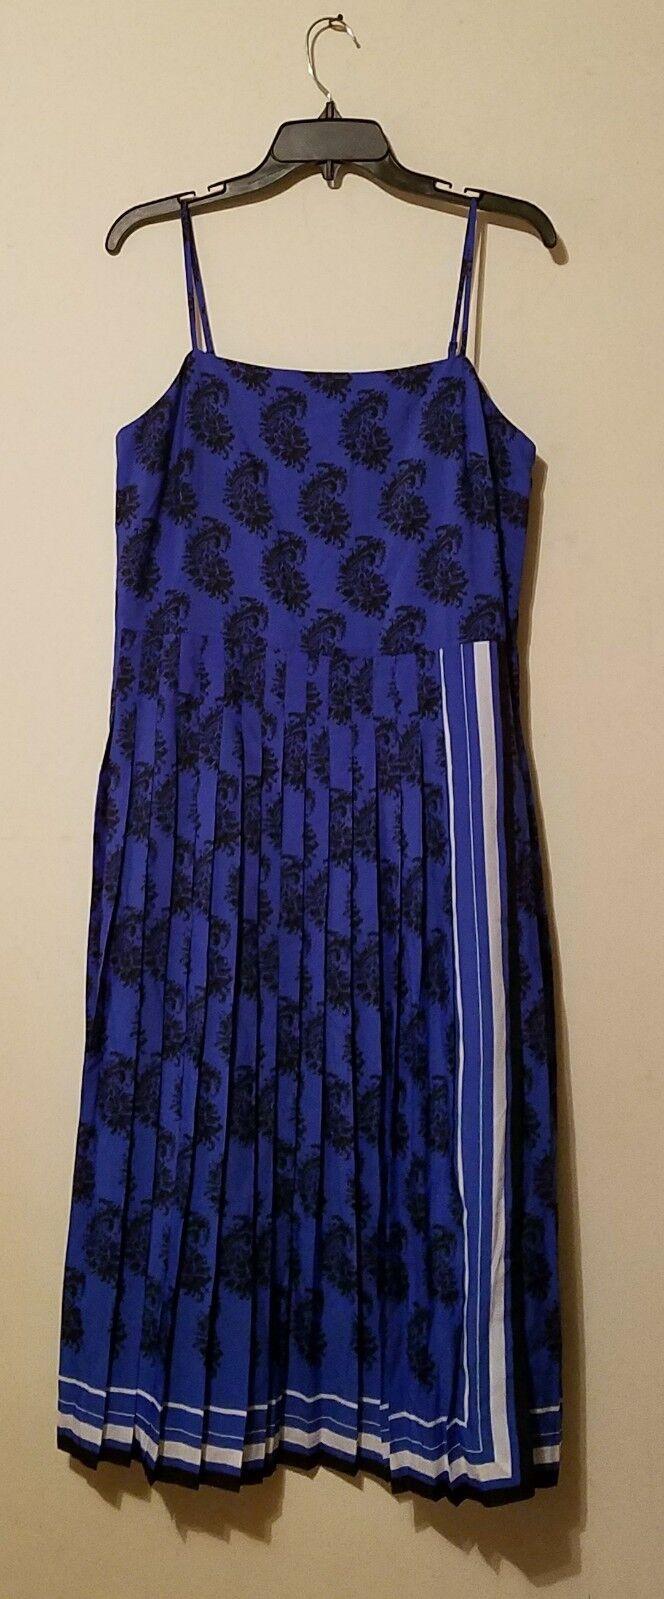 Banana Republic Paisley Pleated Dress Petite  Größe 10p